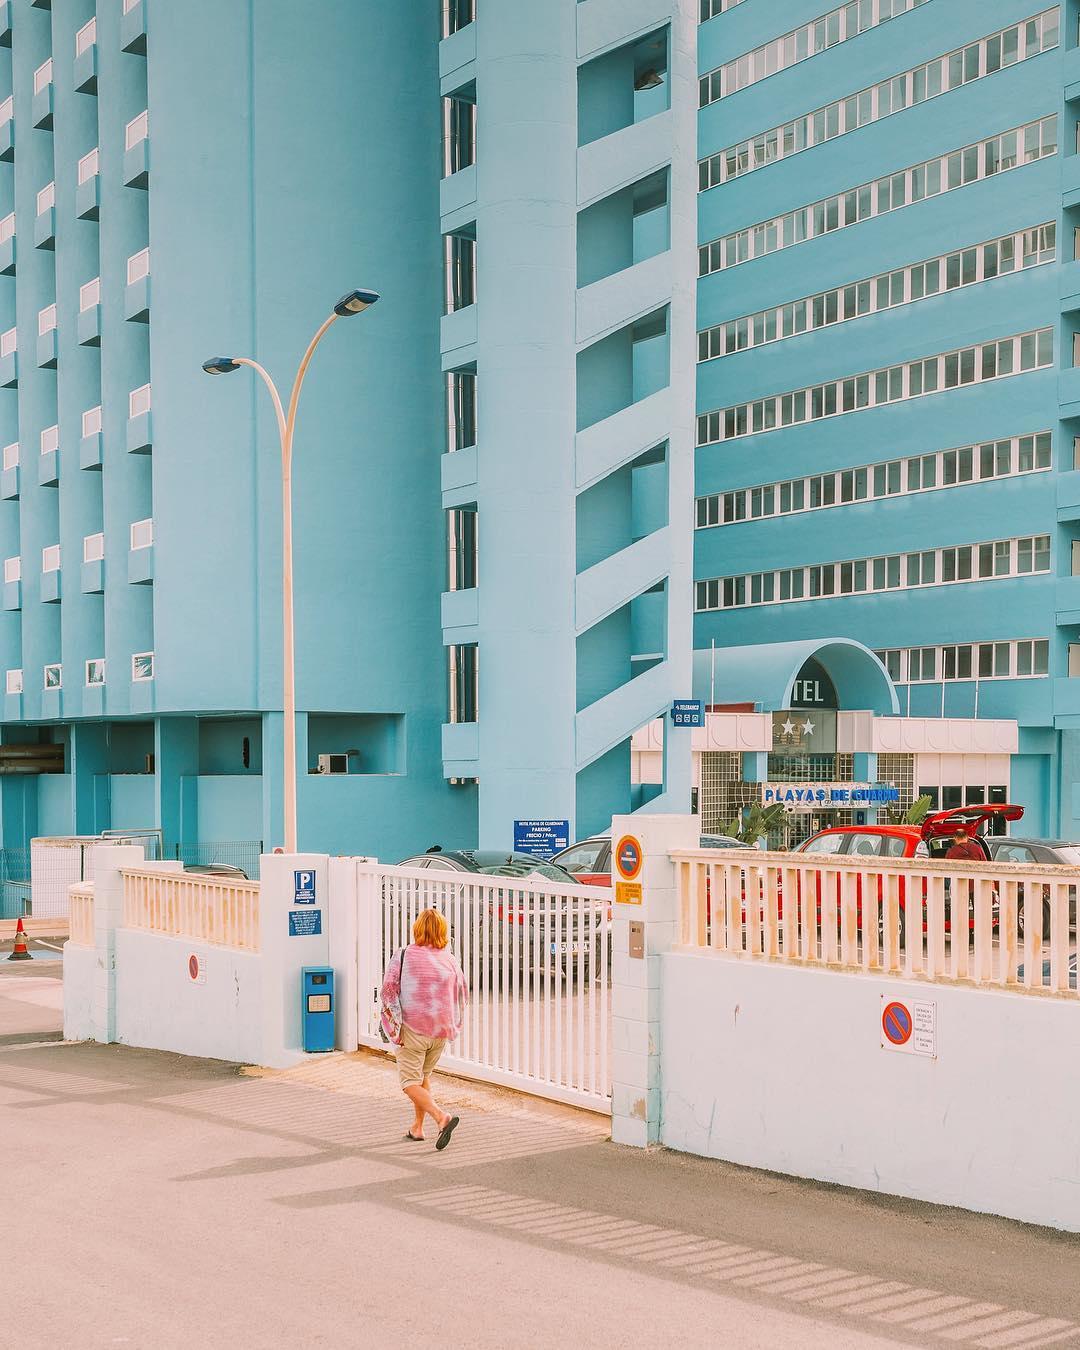 fotografo Joaquin Lucas paleta de colores de Wes Anderson  (8)